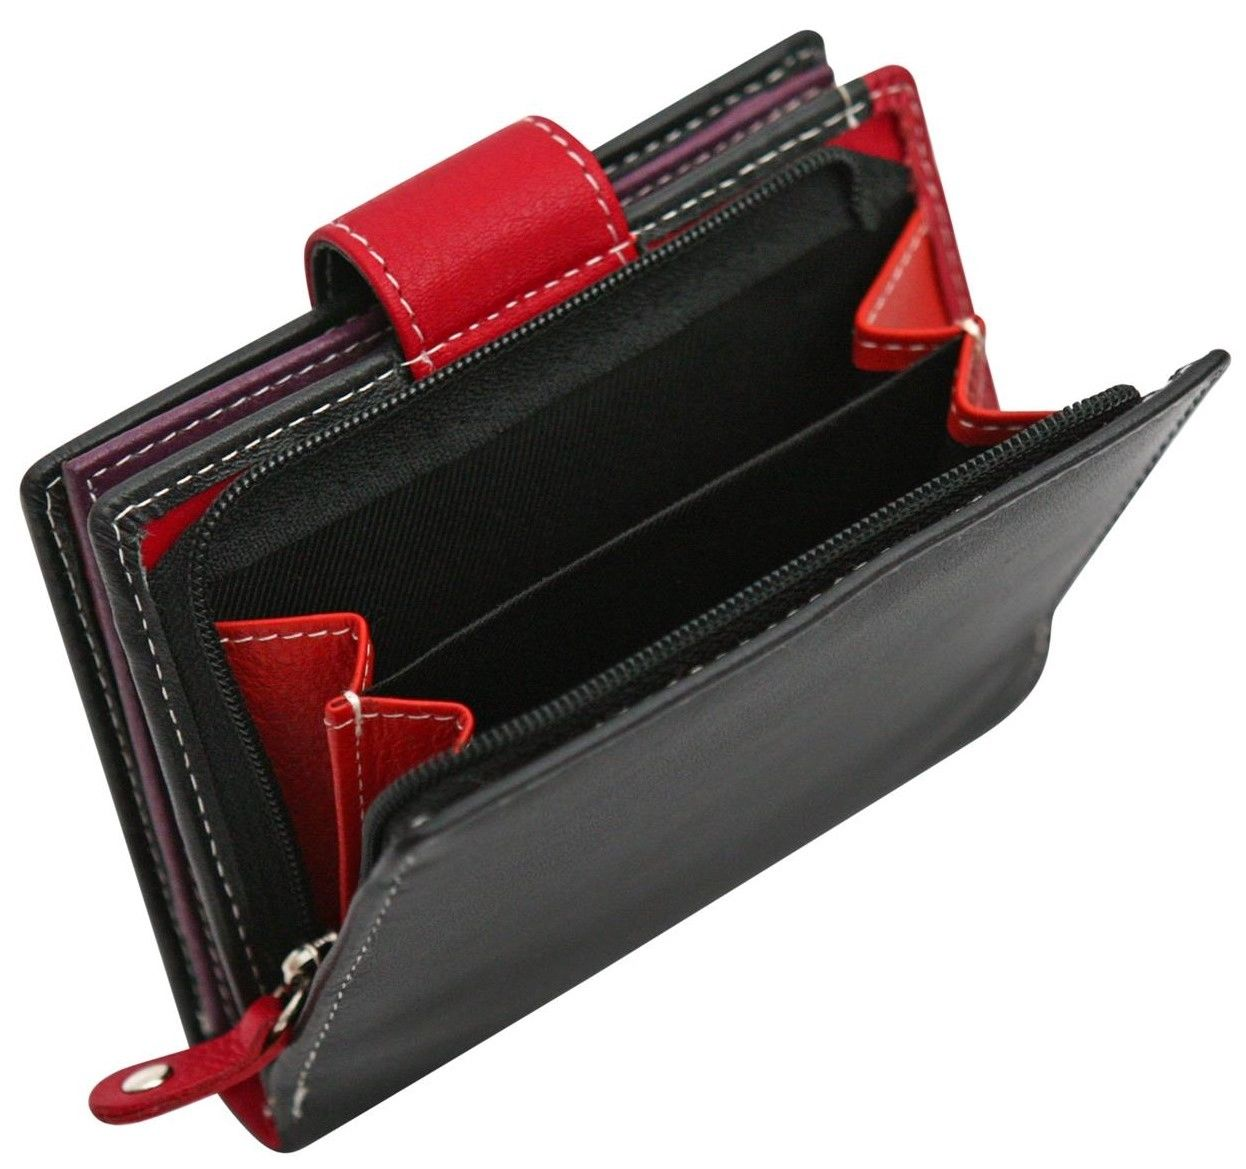 Felda-RFID-onorevoli-MEDAGLIA-amp-Card-Purse-Wallet-Genuine-Leather-Multi-SOFT-BOX-REGALO miniatura 18